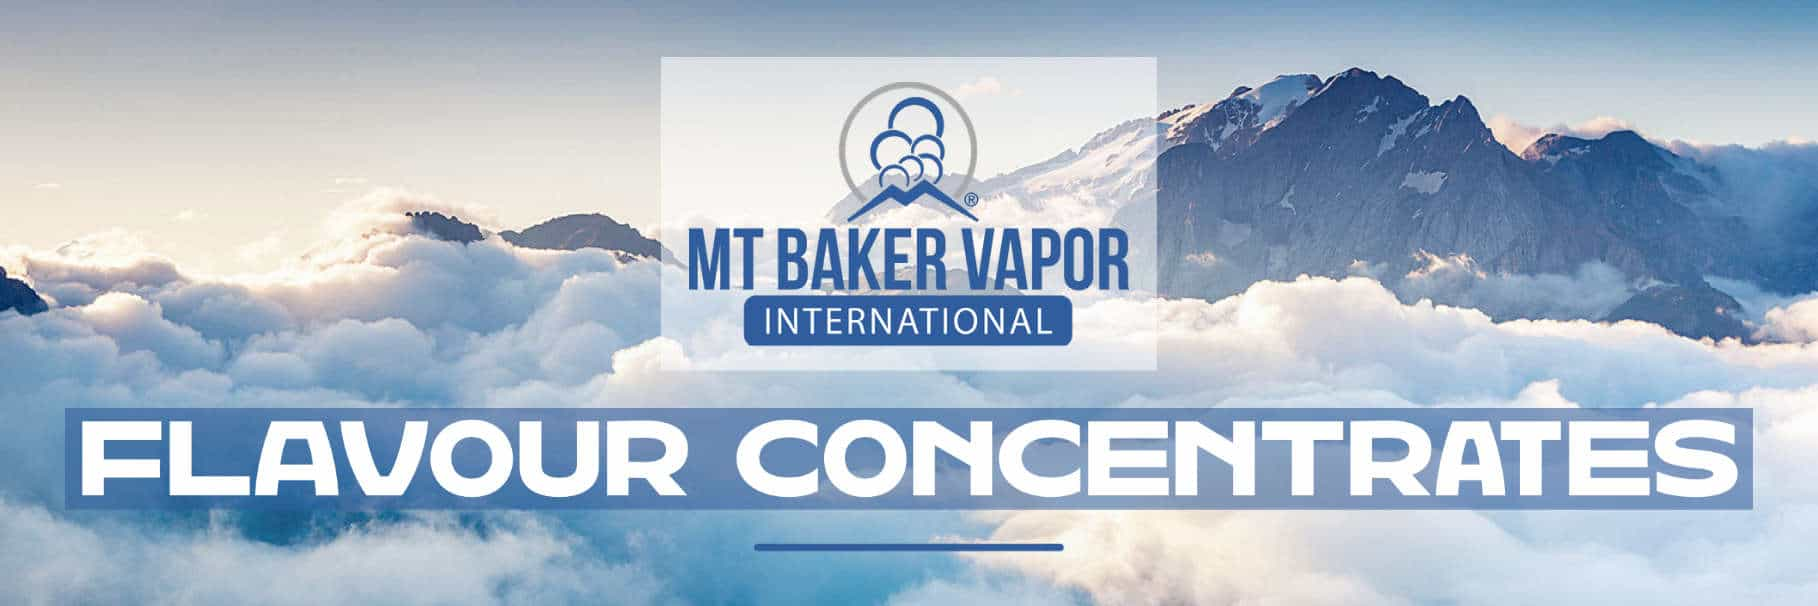 MBV Aromakonzentrate Banner